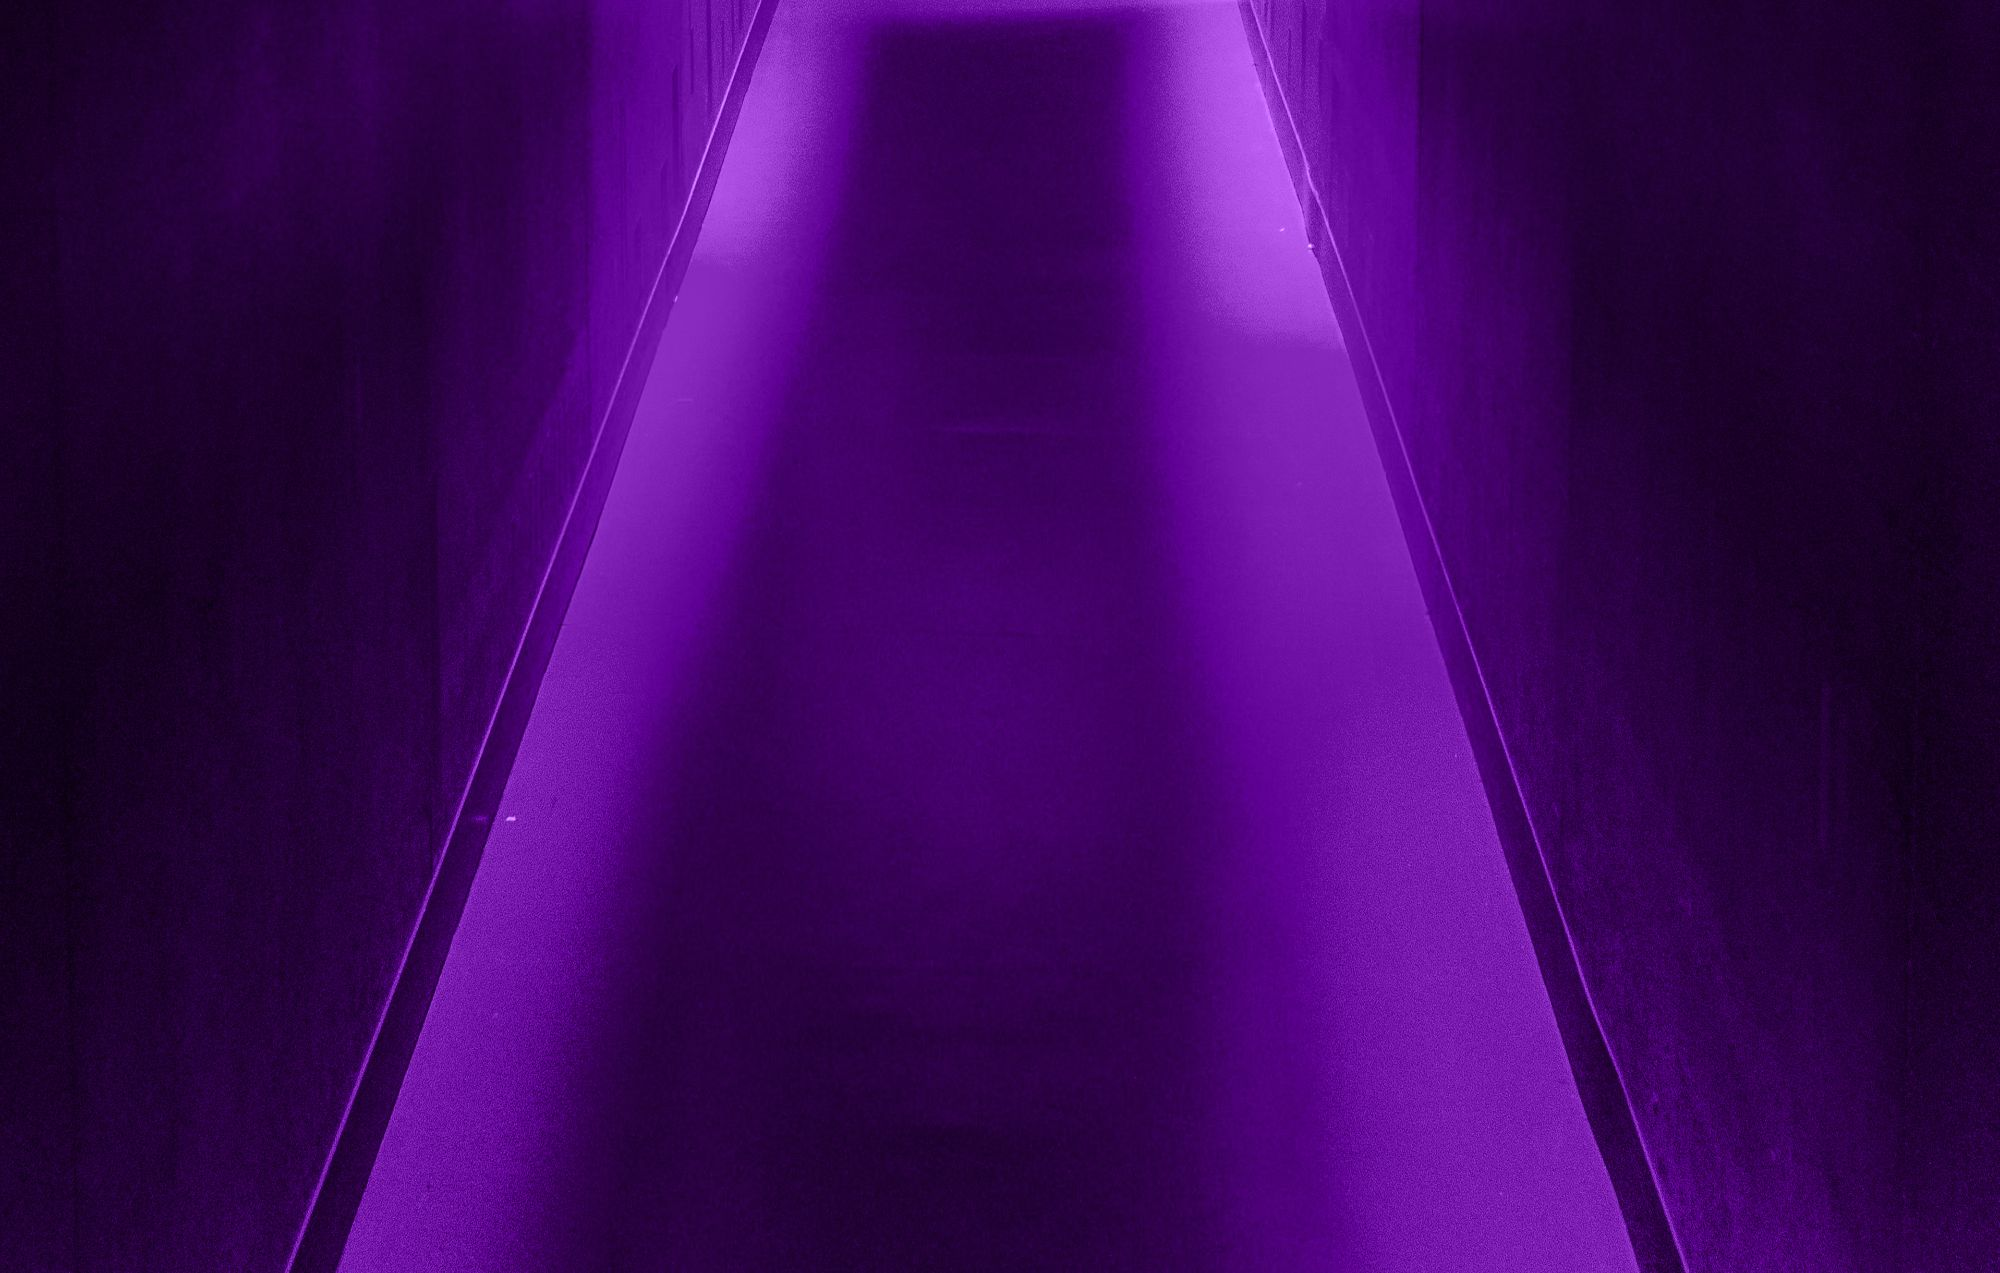 Background image of purple